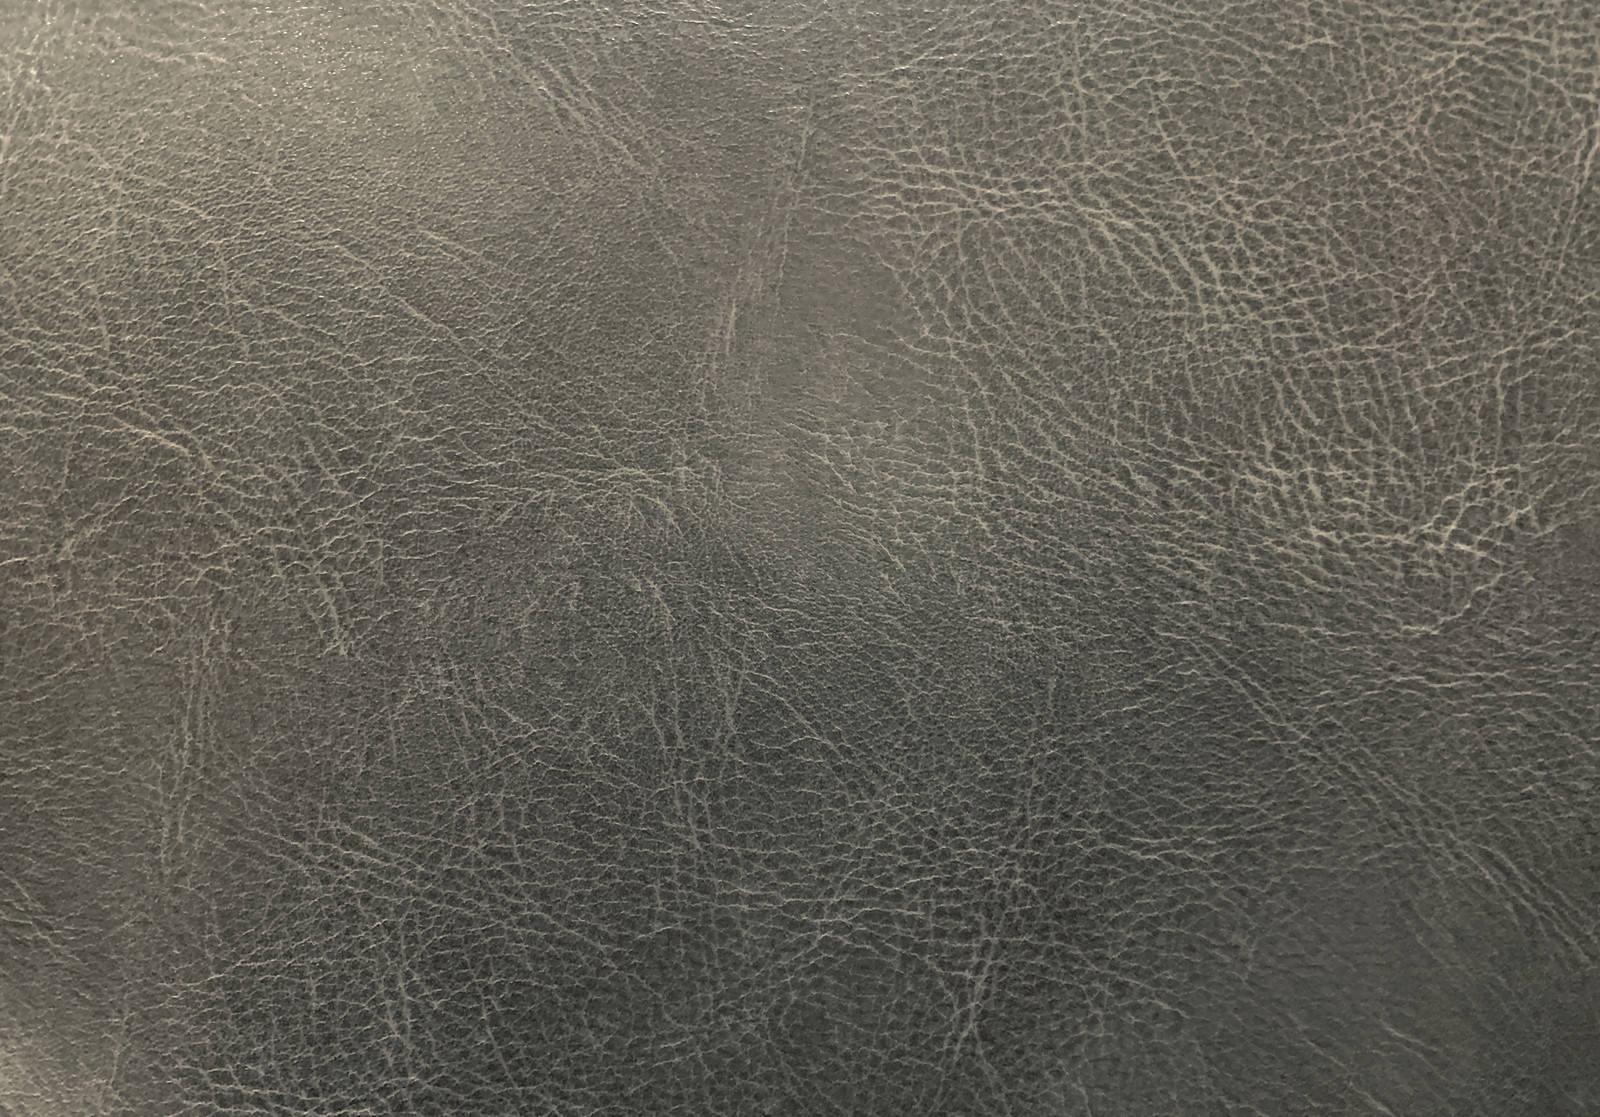 texture962372 TP V - レザーテックスソファの評判を5つに分けて解説!